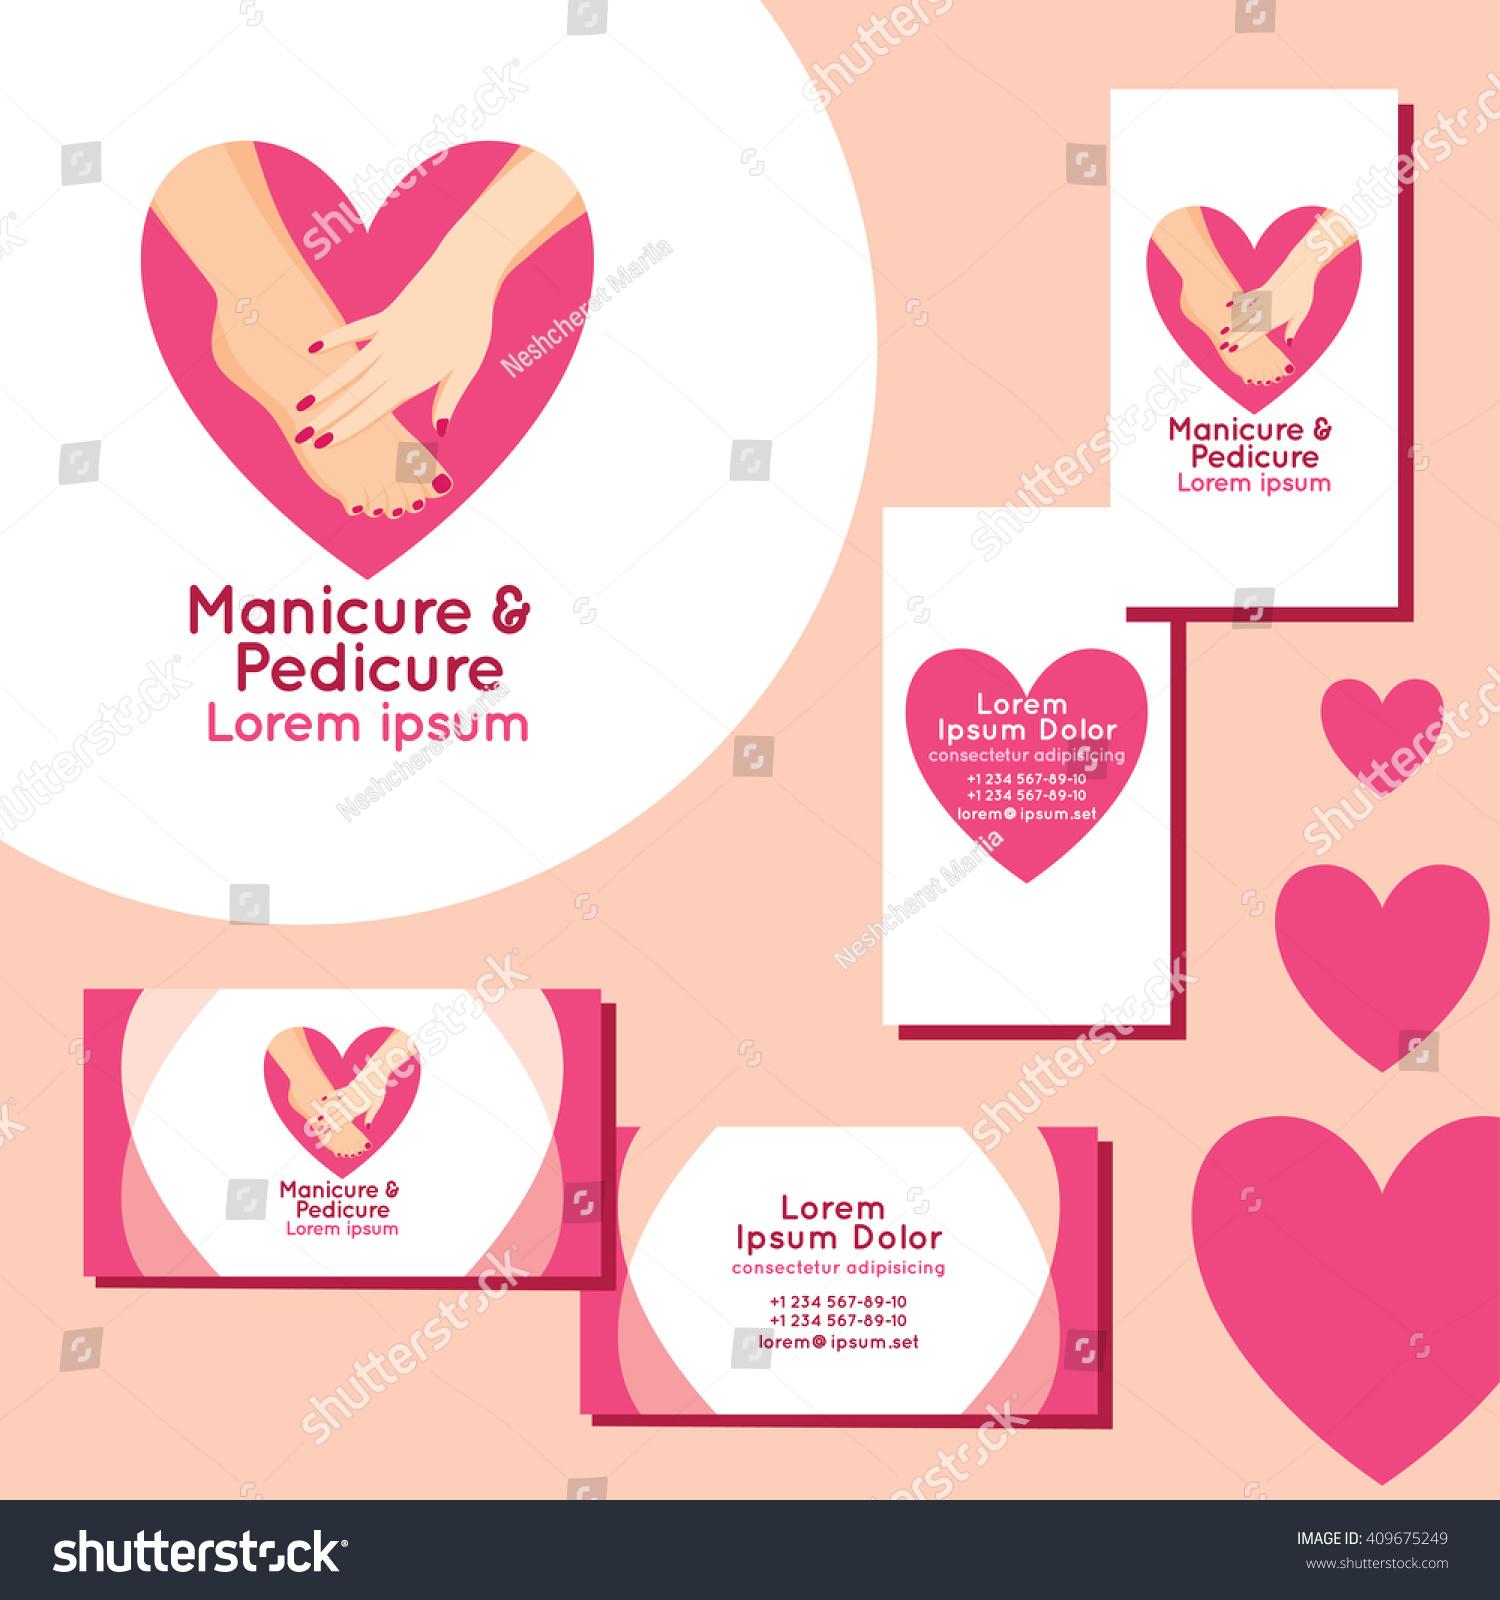 Manicure Pedicure Logo Set Business Cards Stock Vector 409675249 ...